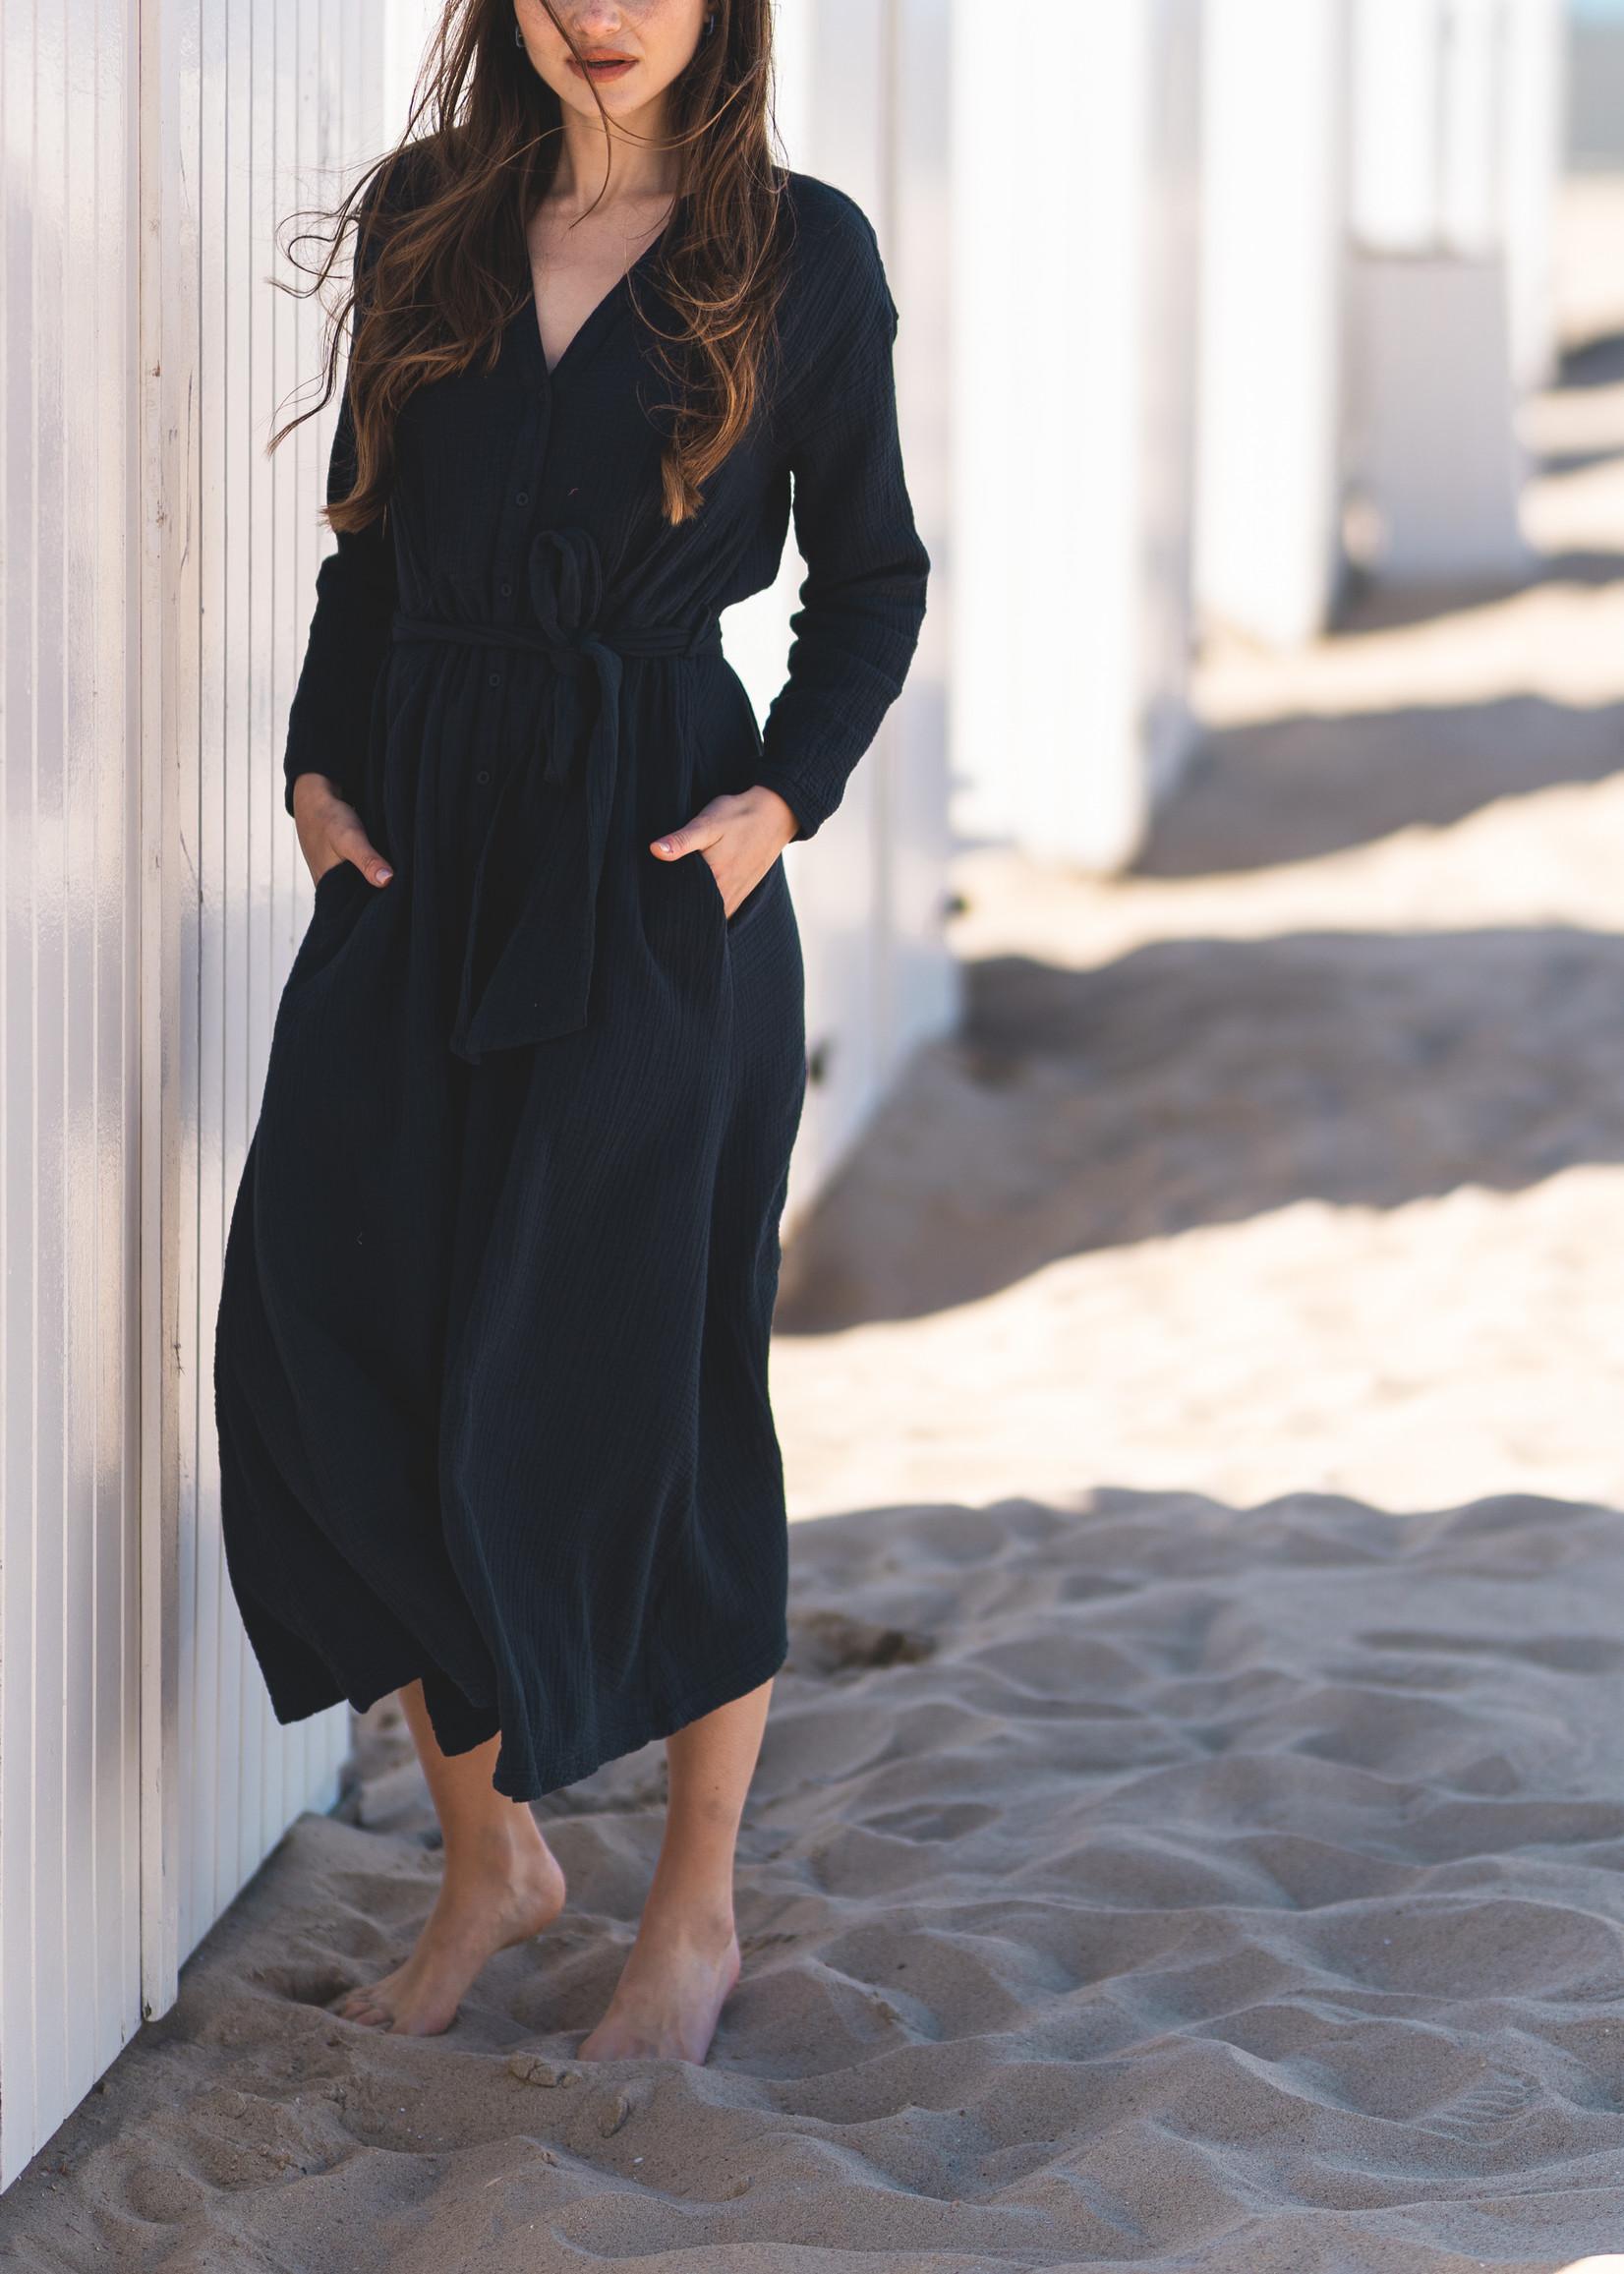 Heavenly Danni Dress - Navy